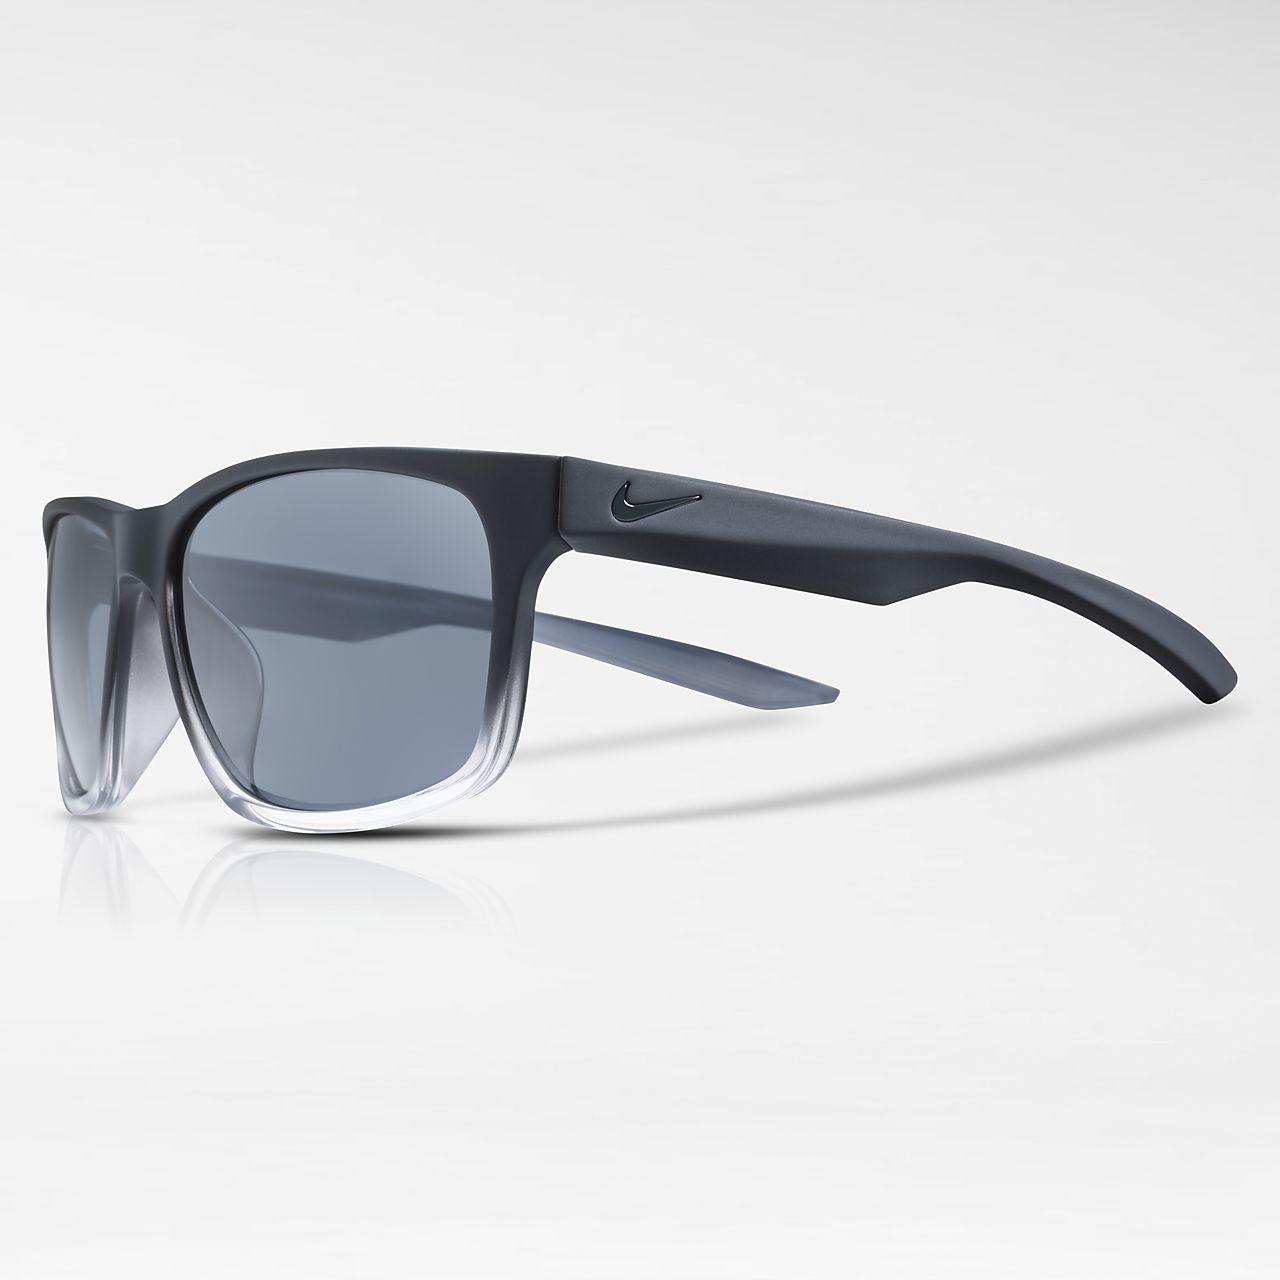 Occhiali da sole Nike Essential Chaser - Nero 2hkLiMrMhQ